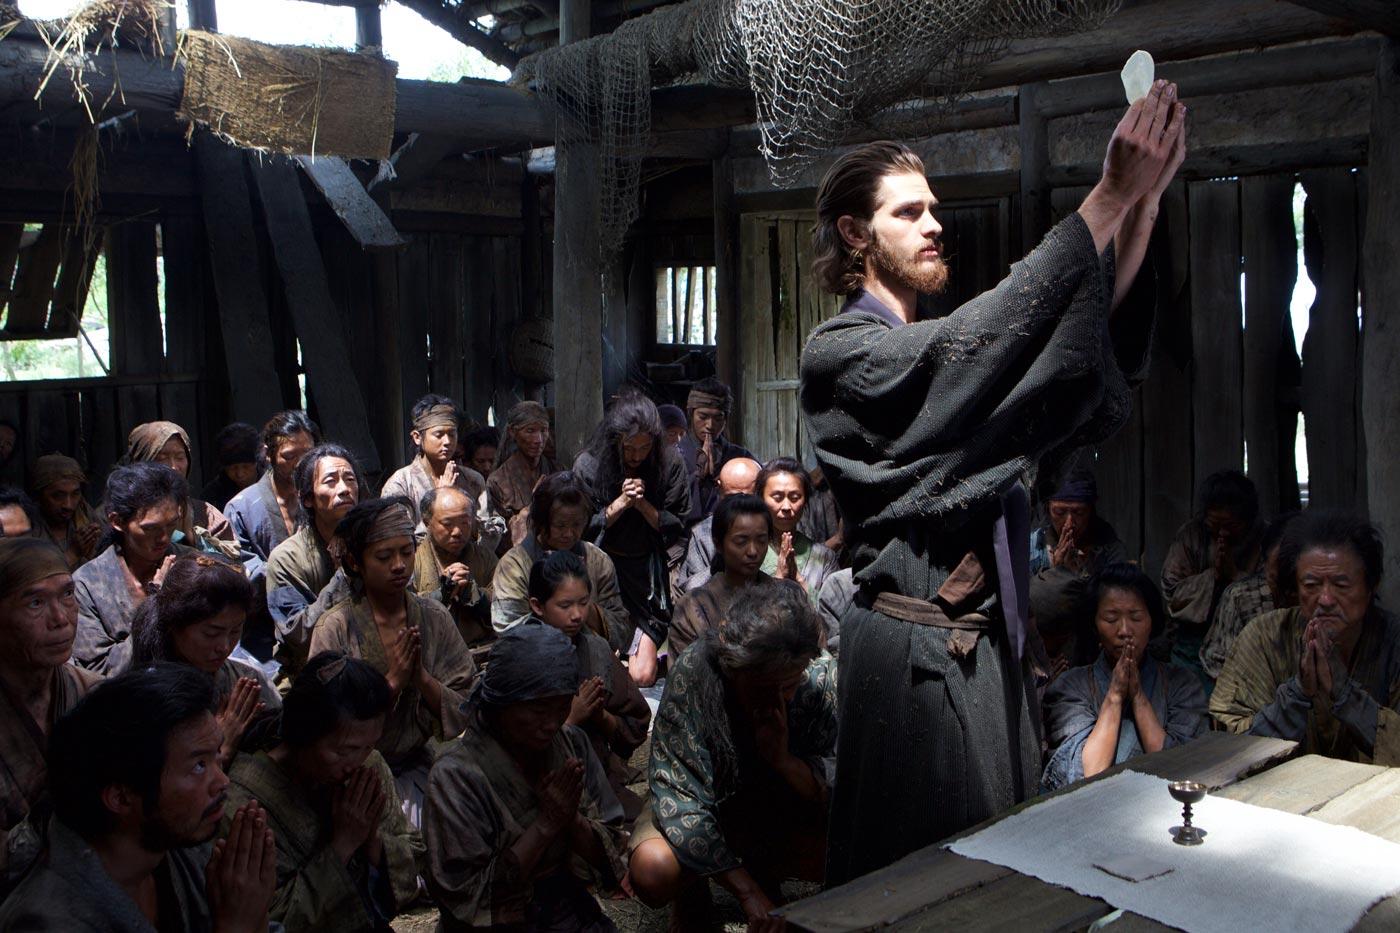 Andrew Garfield: Finding Faith through Art